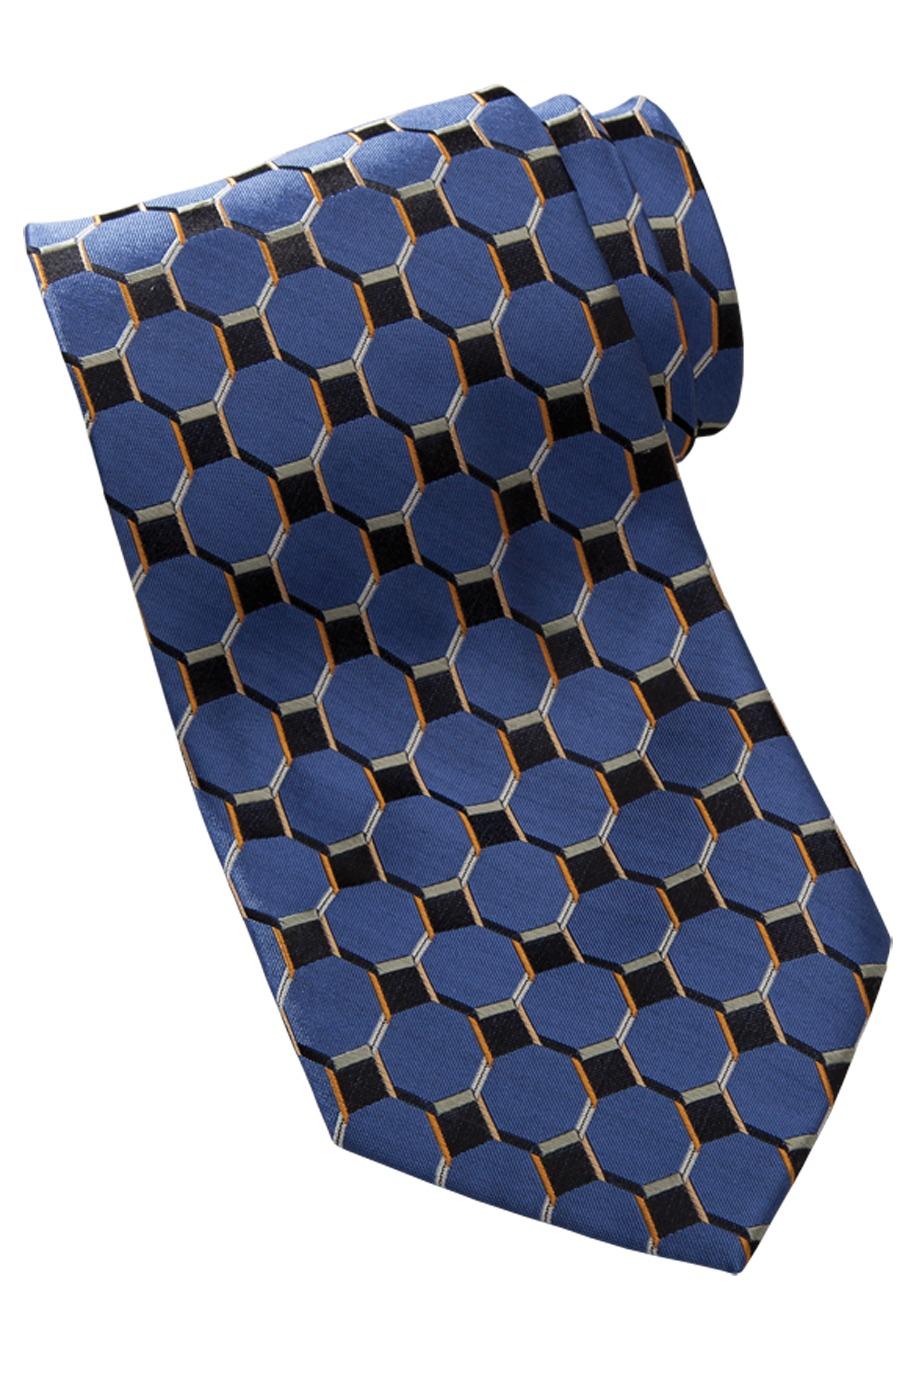 Edwards Garment HC00 - Signature Silk Honeycomb Tie